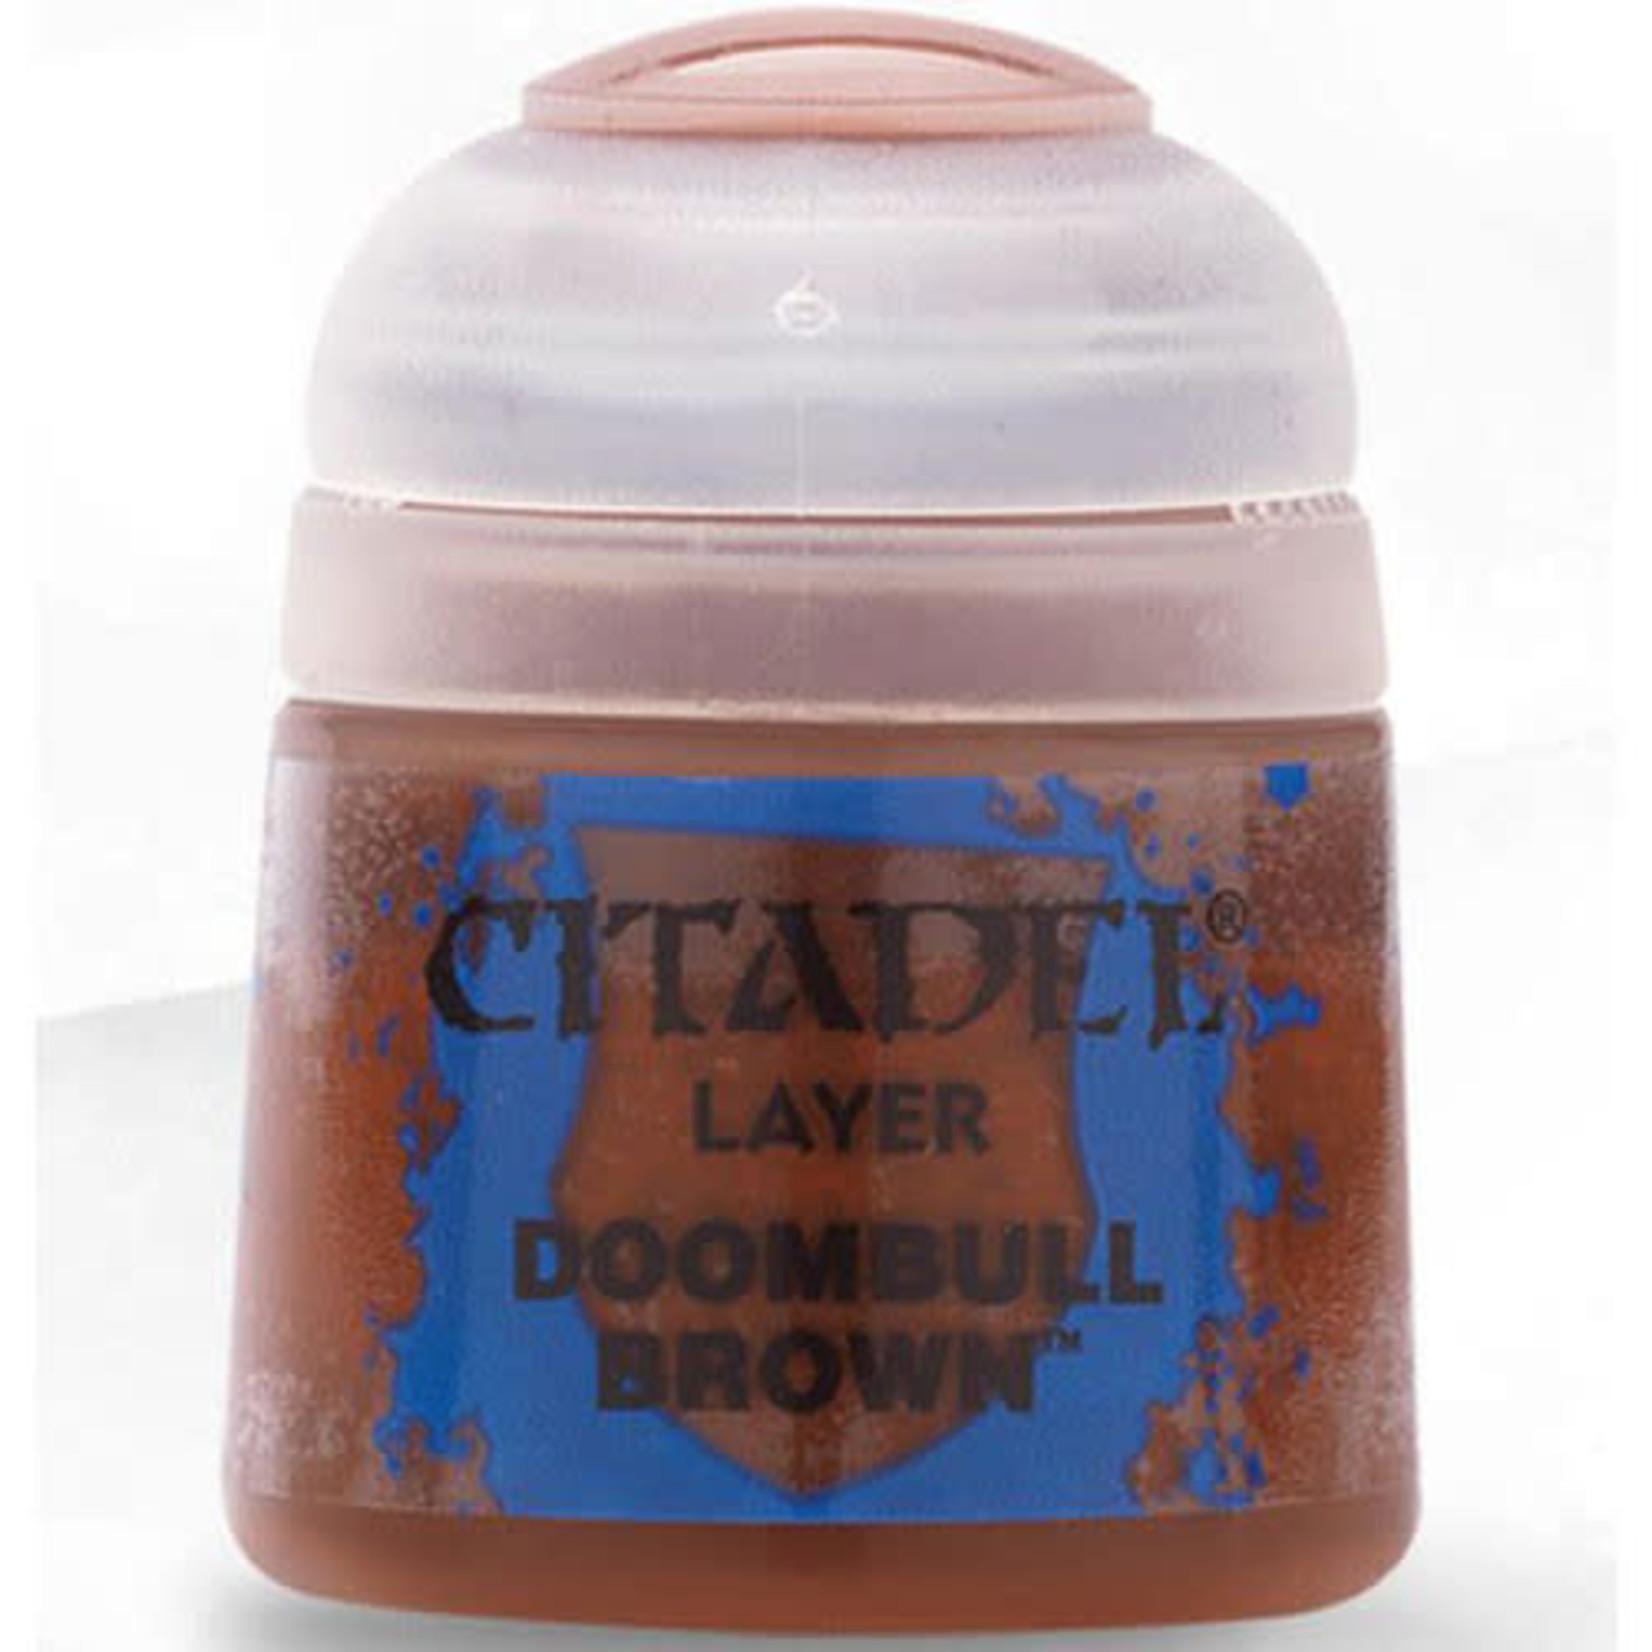 Games Workshop Citadel Paint: Doombull Brown 12ml